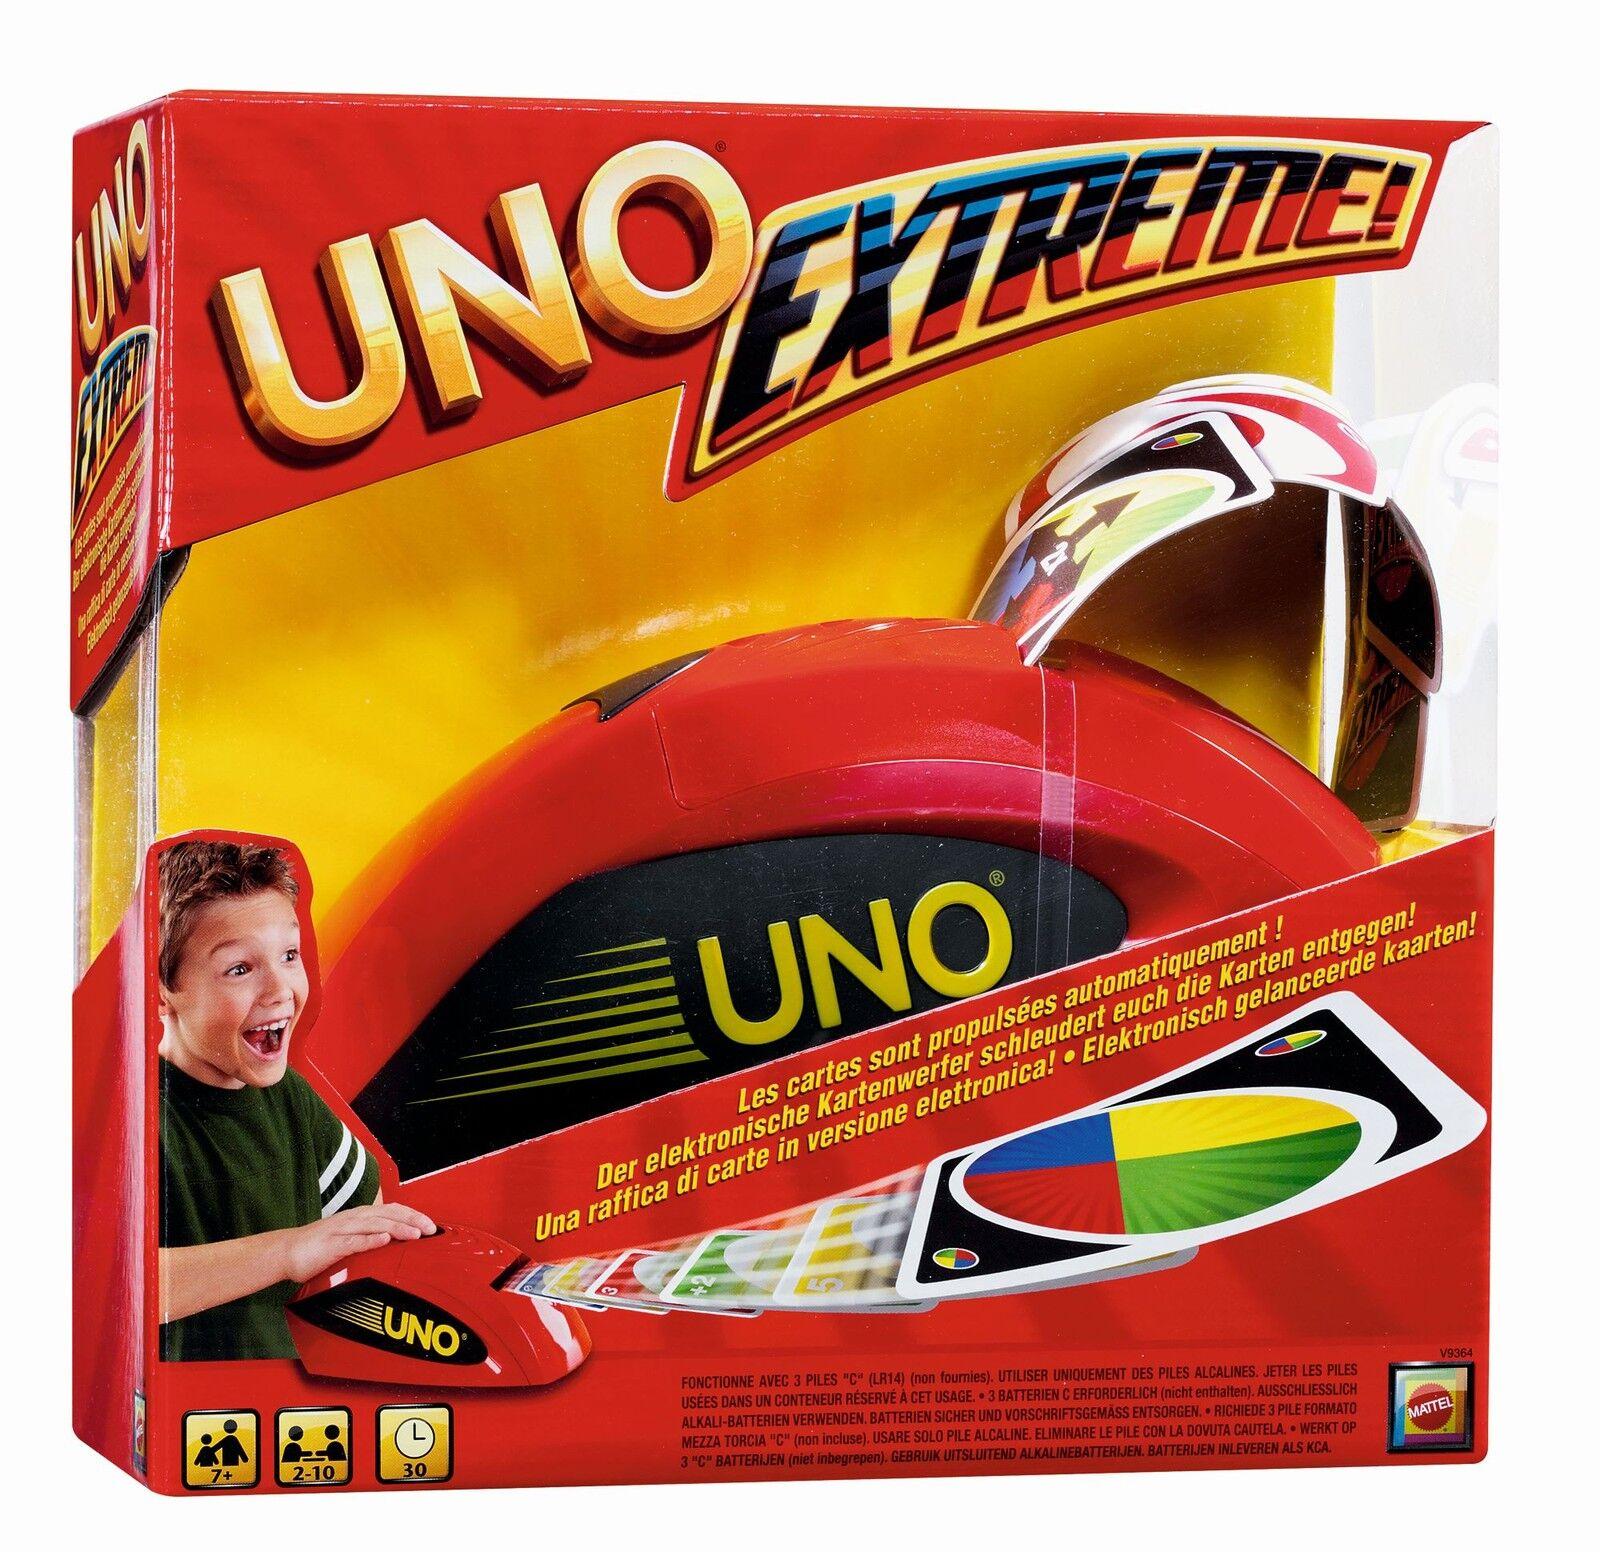 Mattel - uno  Estremo, V9364, Nuovo   Conf. Orig.  comodamente